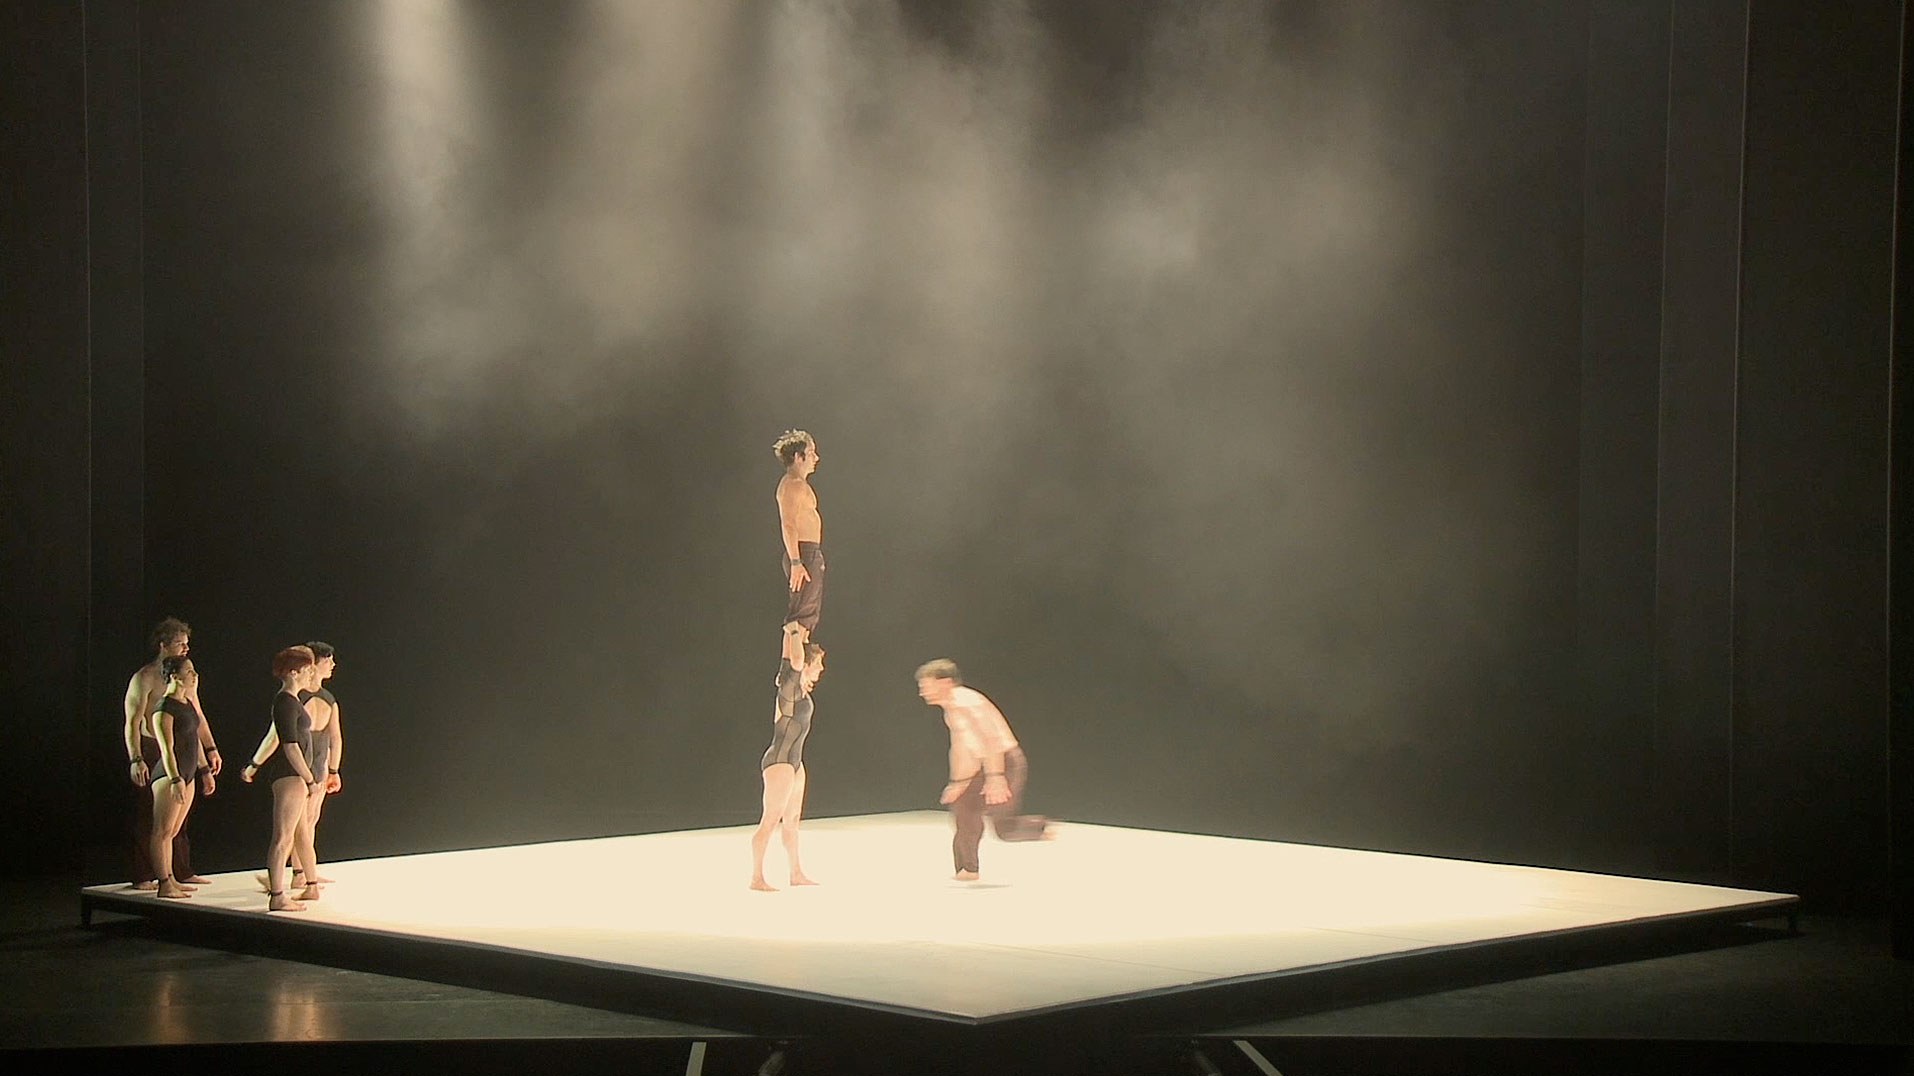 75a aus Stuttgart schneidet den Company-Trailer für das Colours International Dance Festival 2015 presented by Eric Gauthier